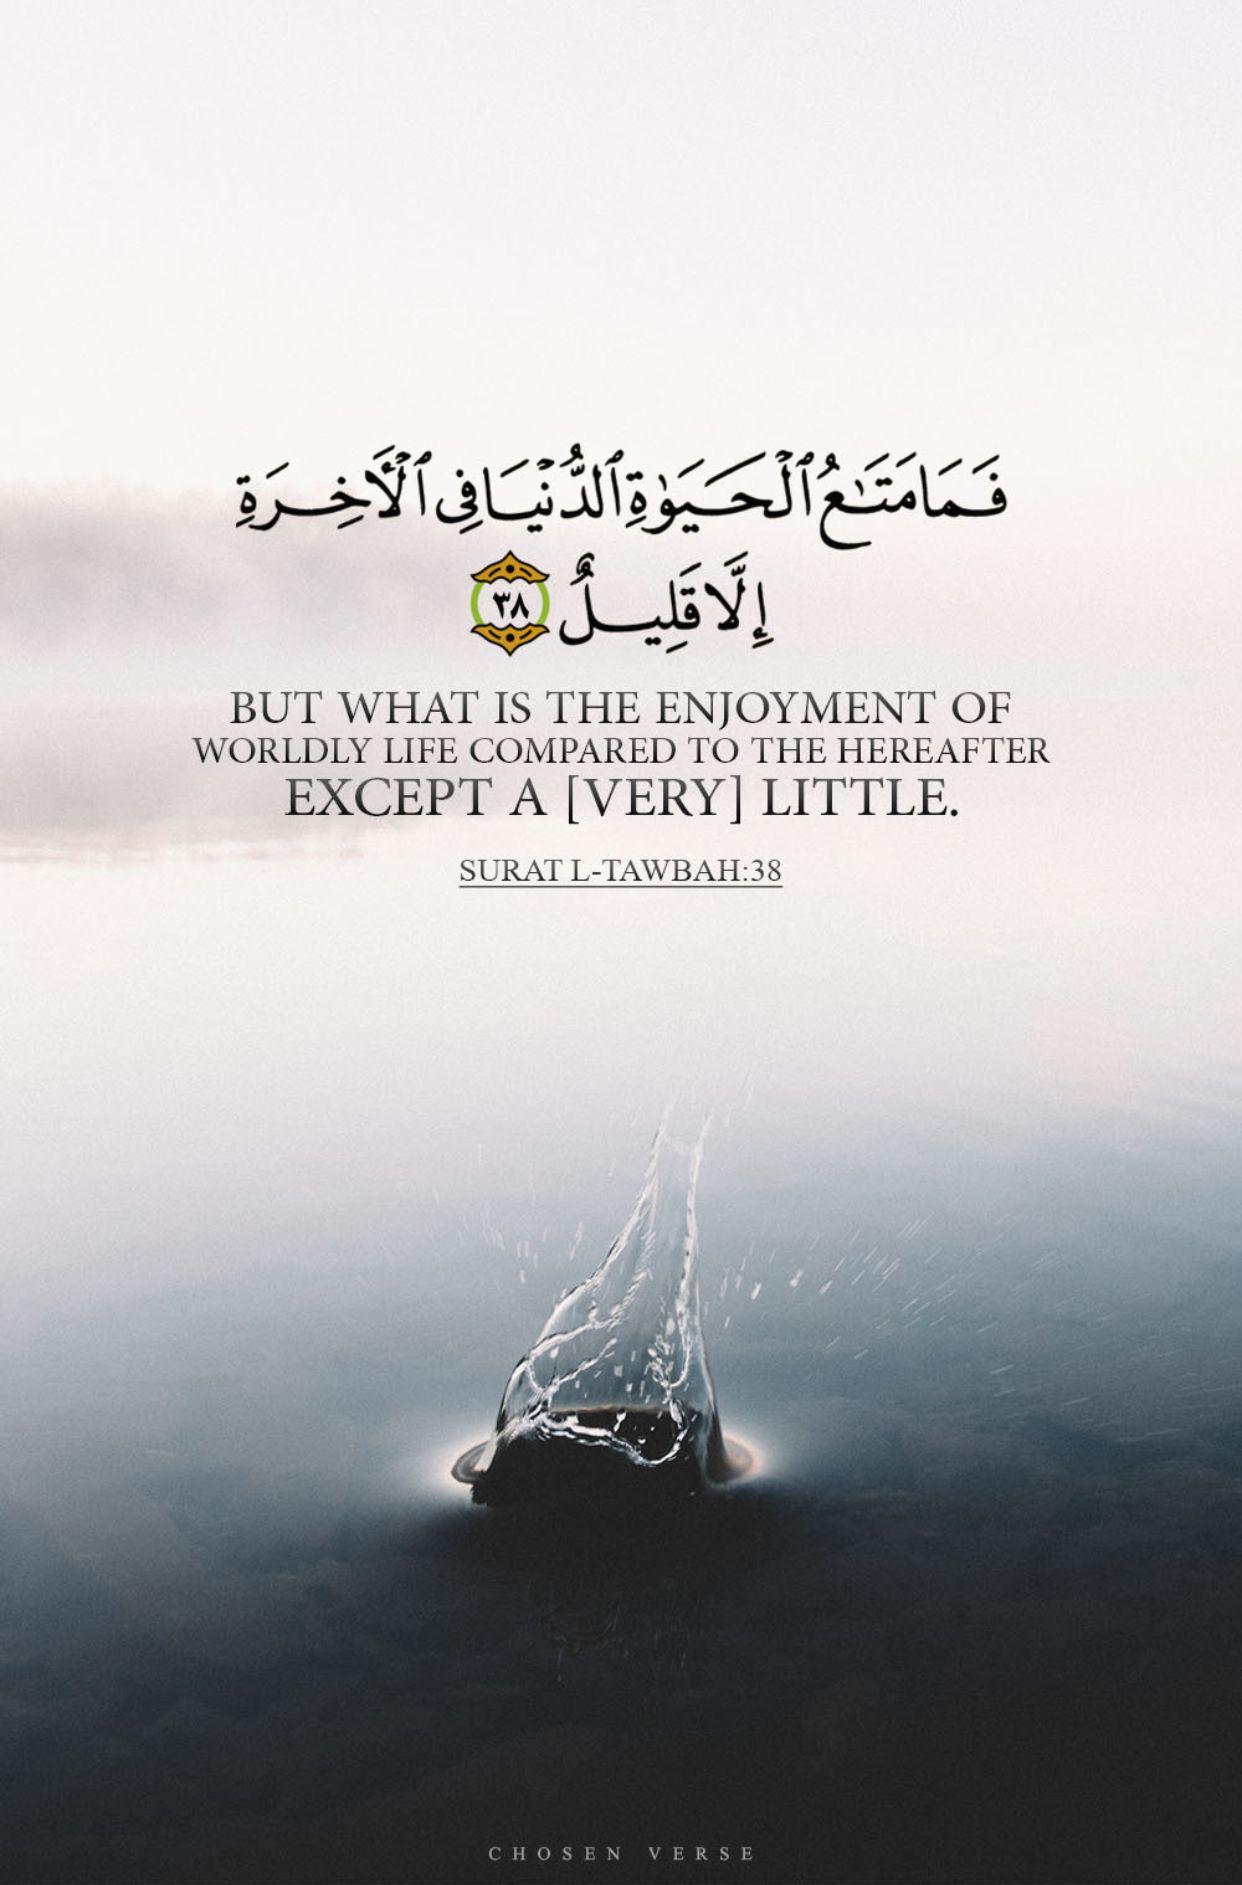 Pin by تدبروا القرآن الكريم on Quran Verses & Islamic Quotes